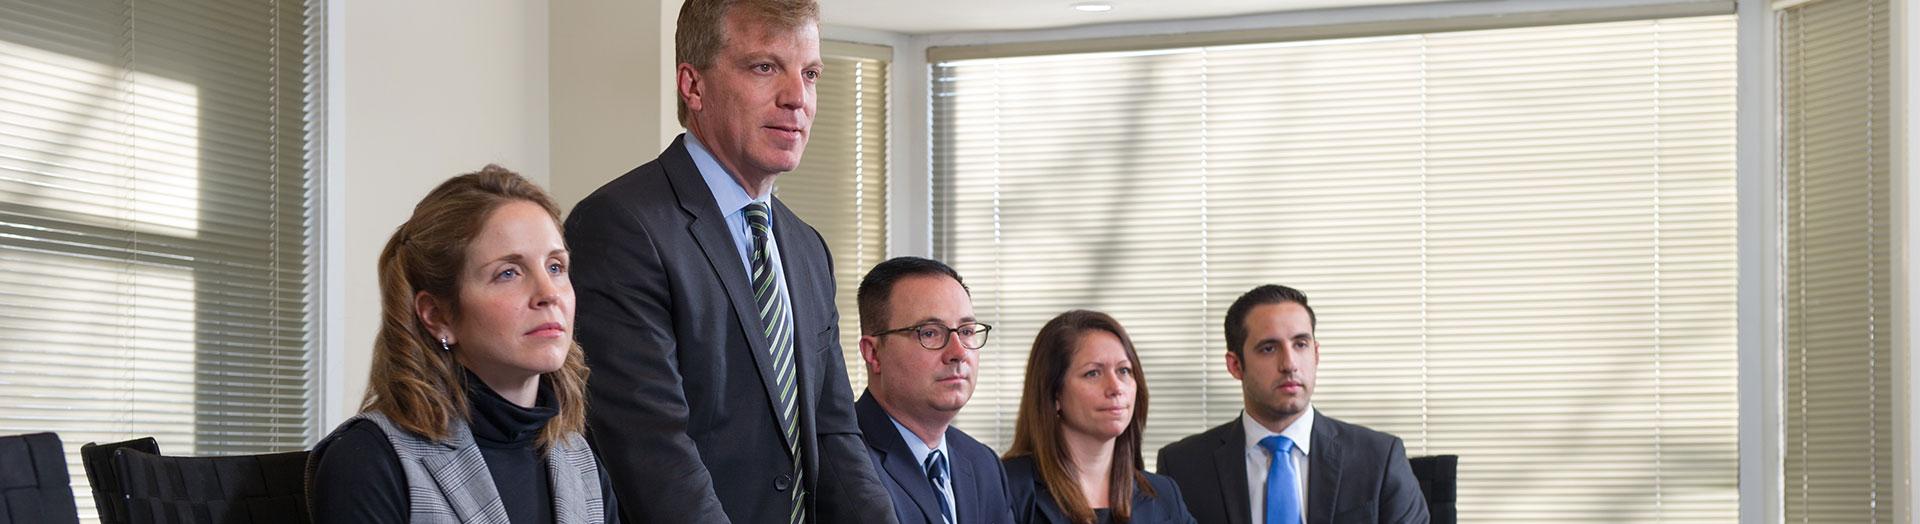 Civil Litigation team